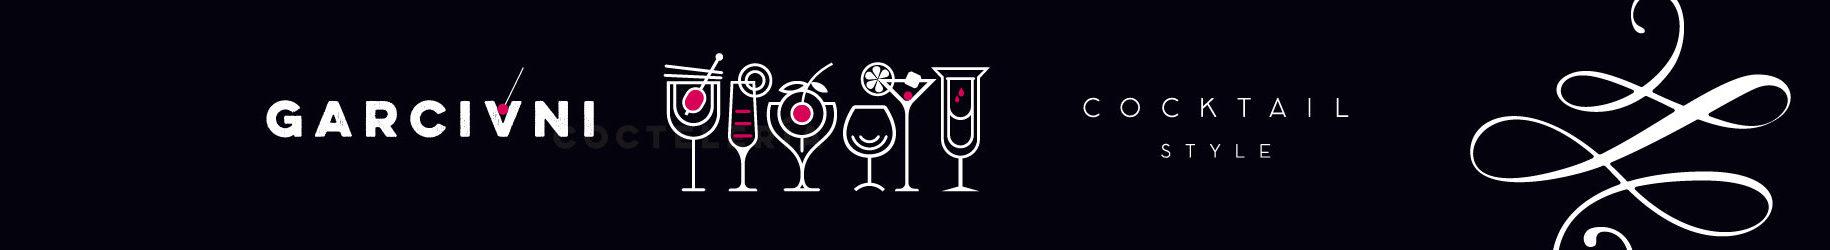 cocktails Garciani vermú Segovia